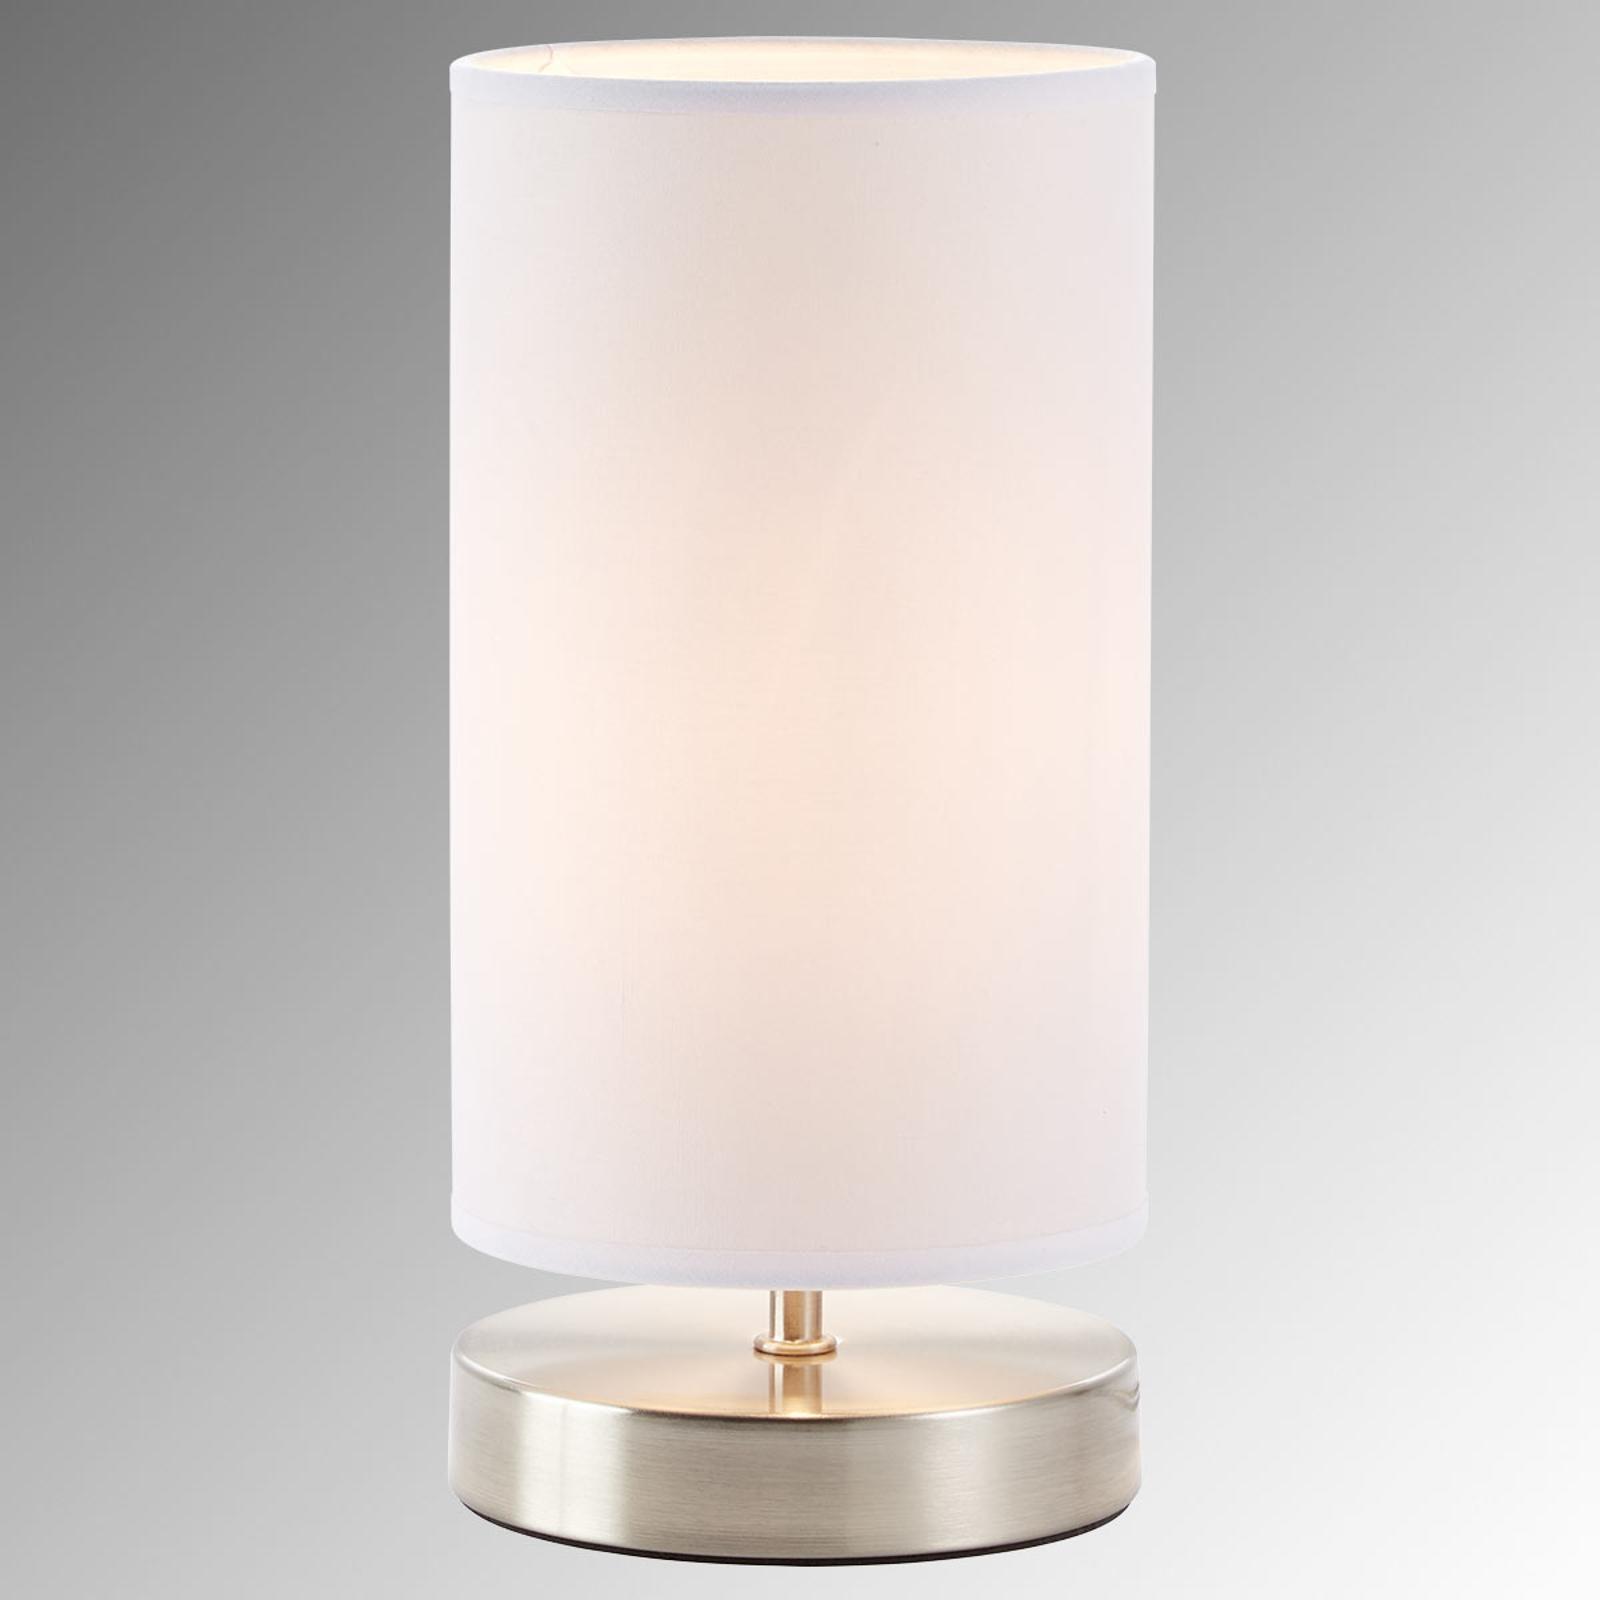 Vit textil-bordslampa Clarie